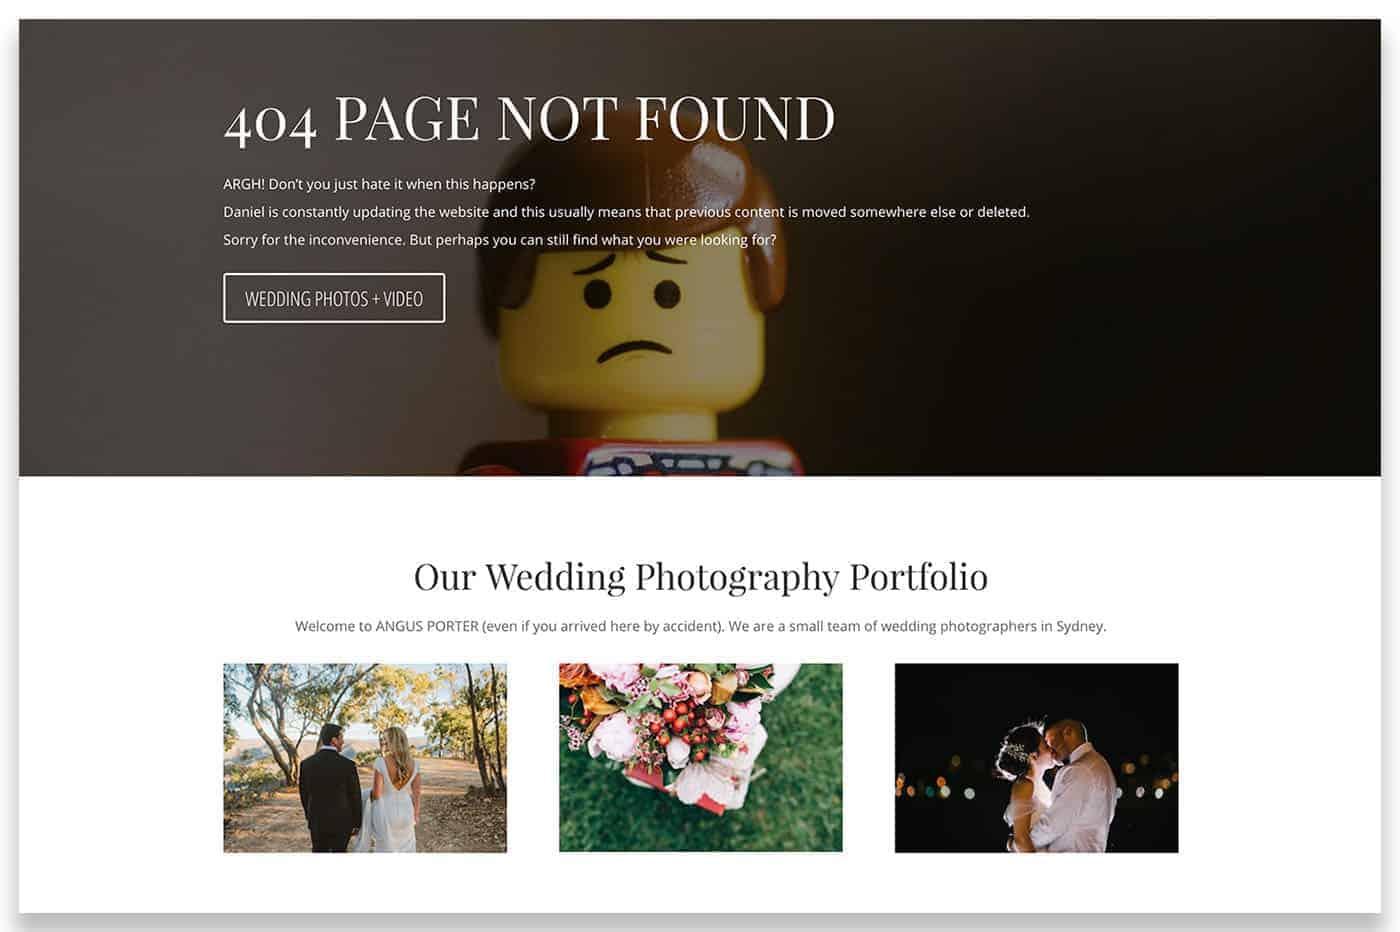 angusporter.com has a custom 404 error page that includes some internal links